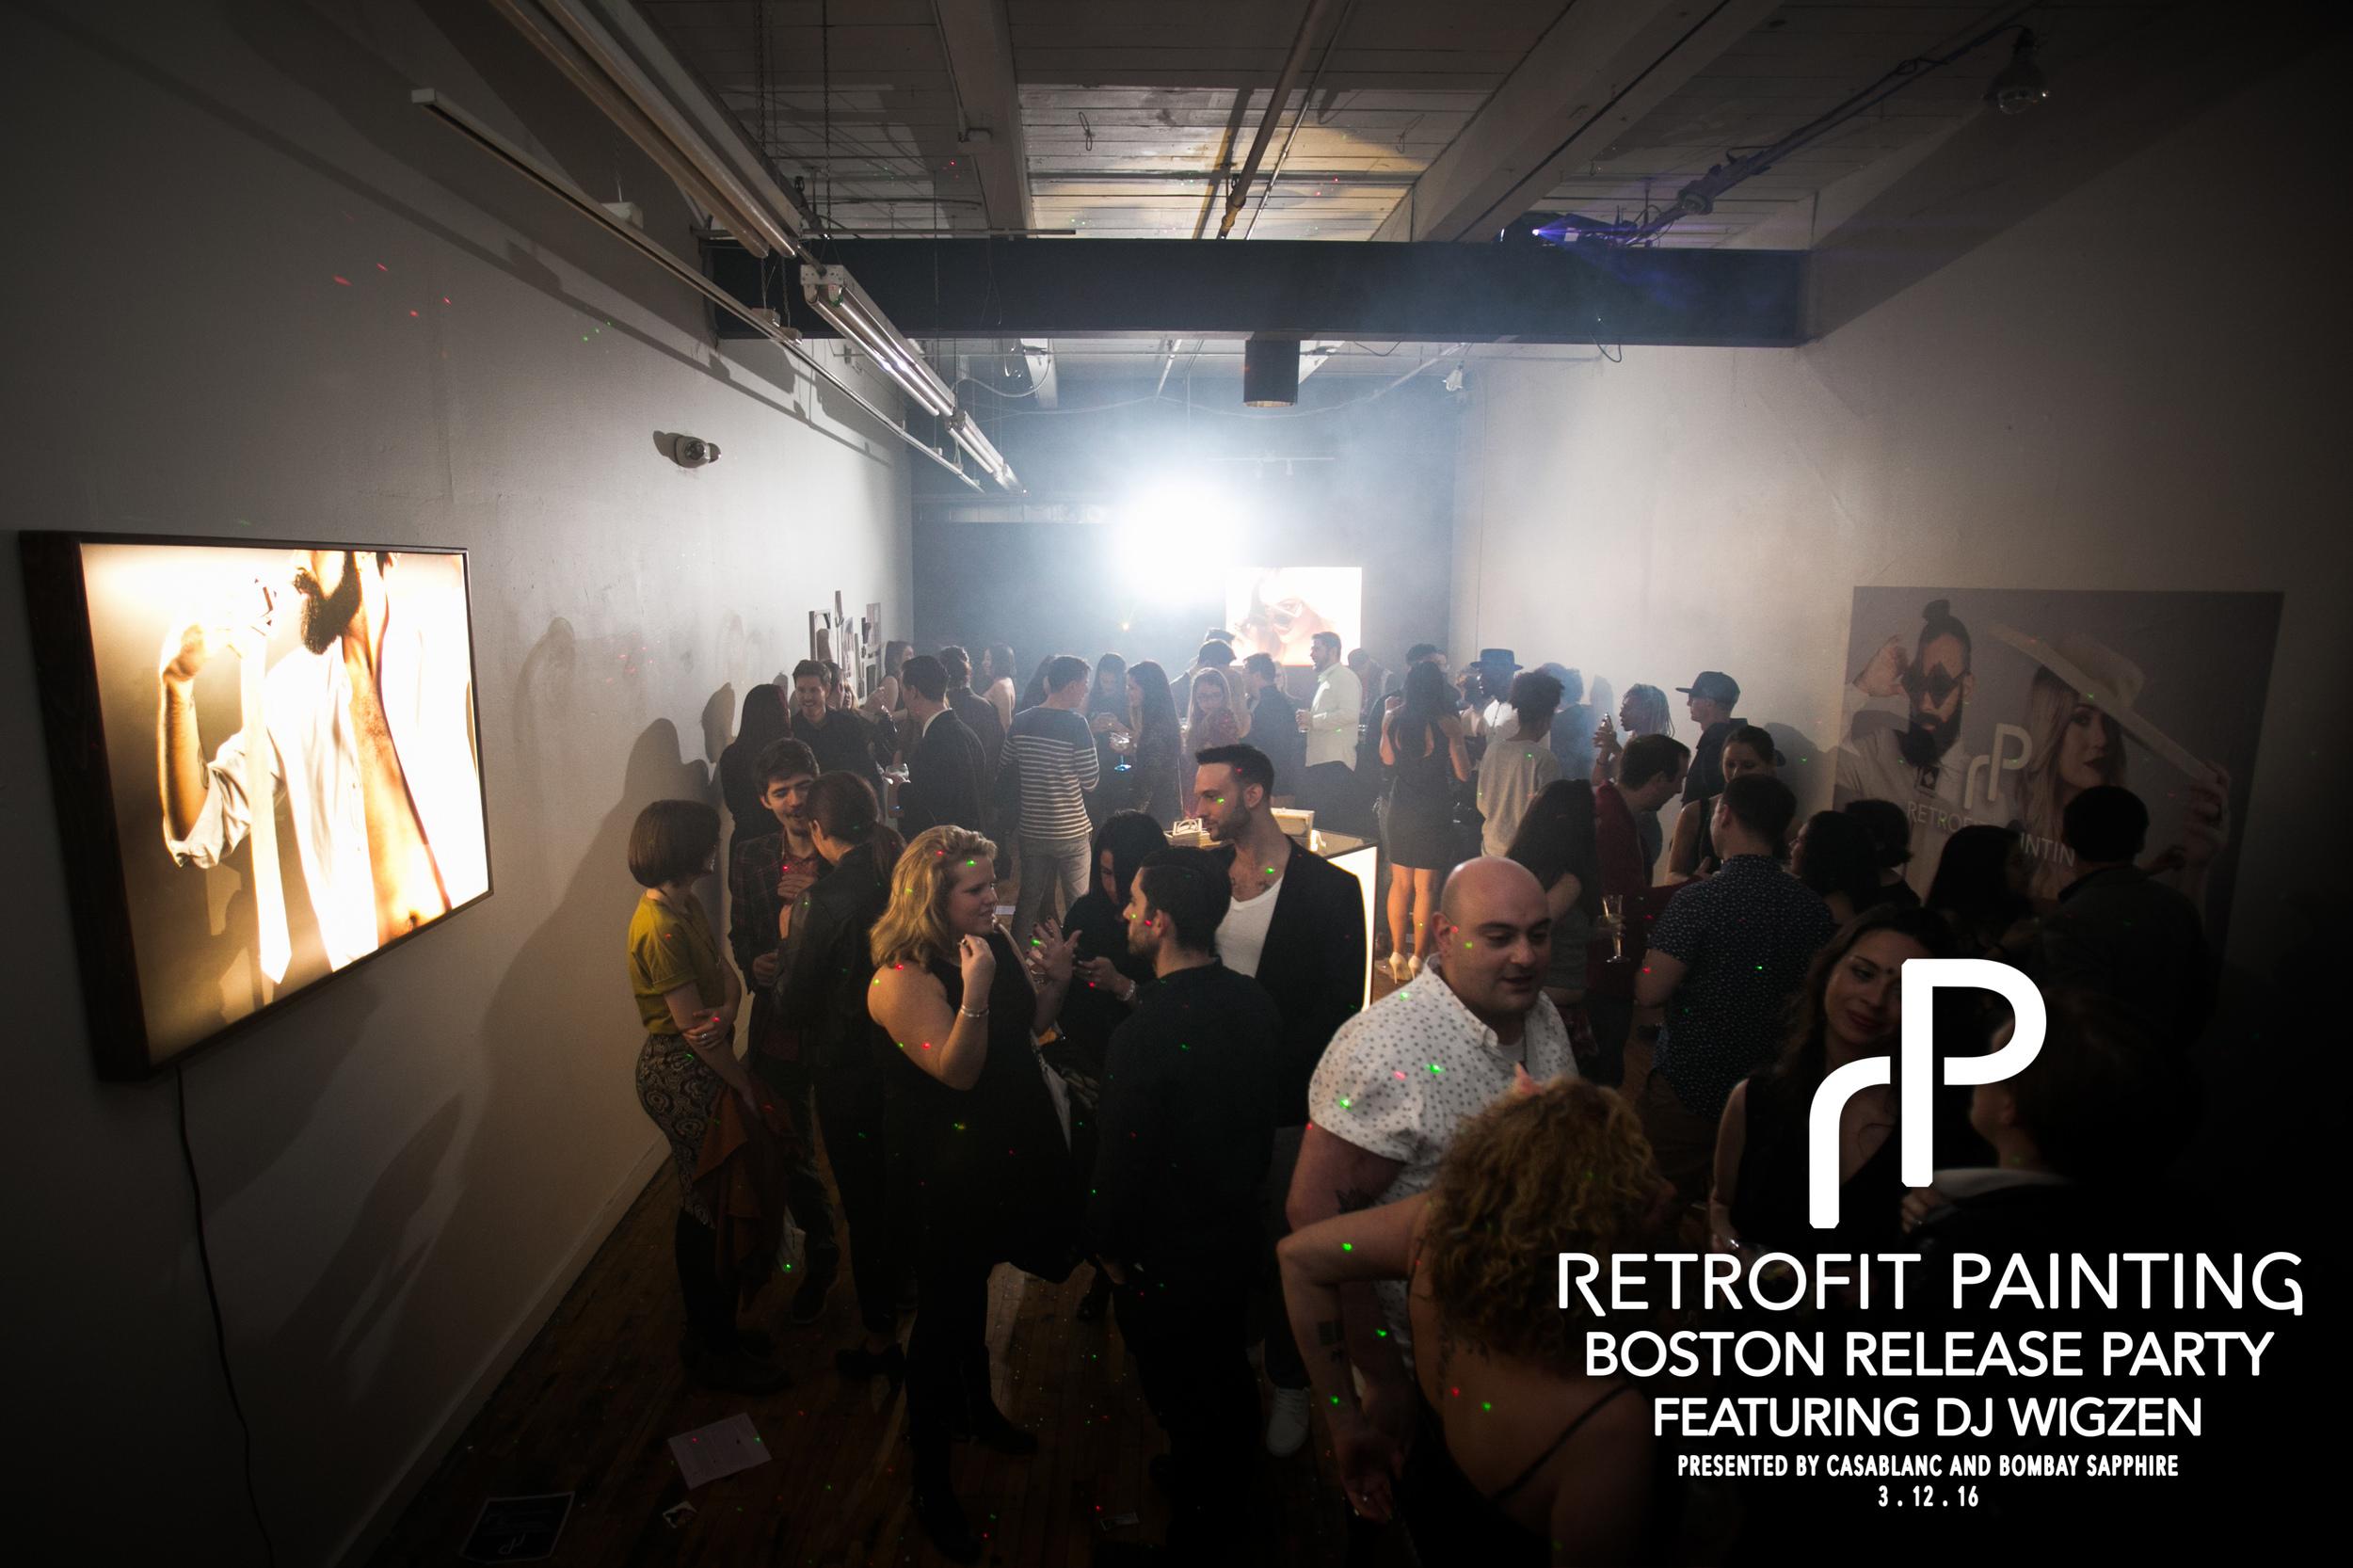 Retrofit Painting Boston Release Party 0207.jpg